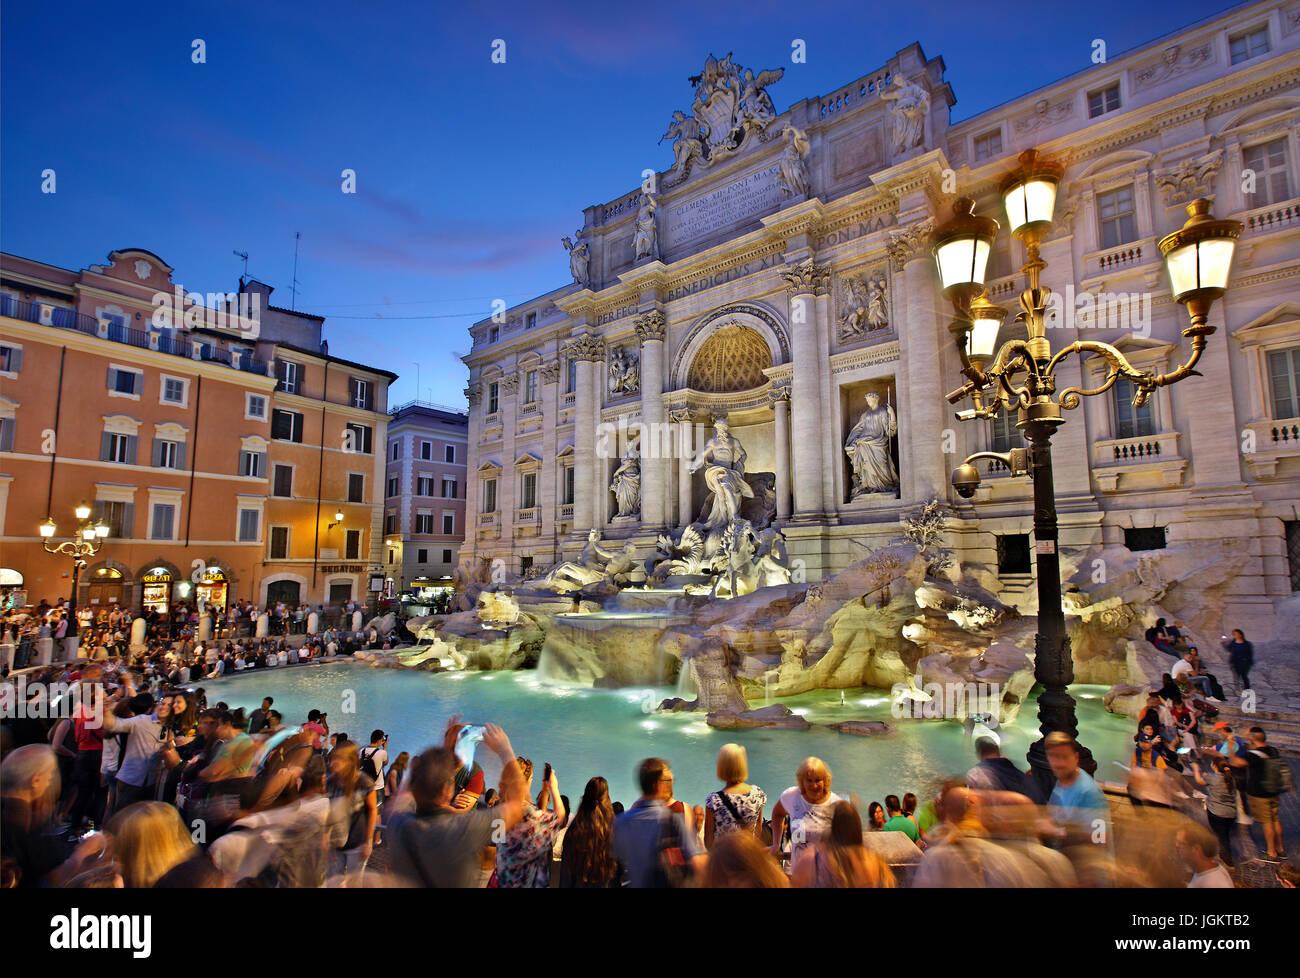 Noche en la Fontana di Trevi, Roma, Italia Imagen De Stock